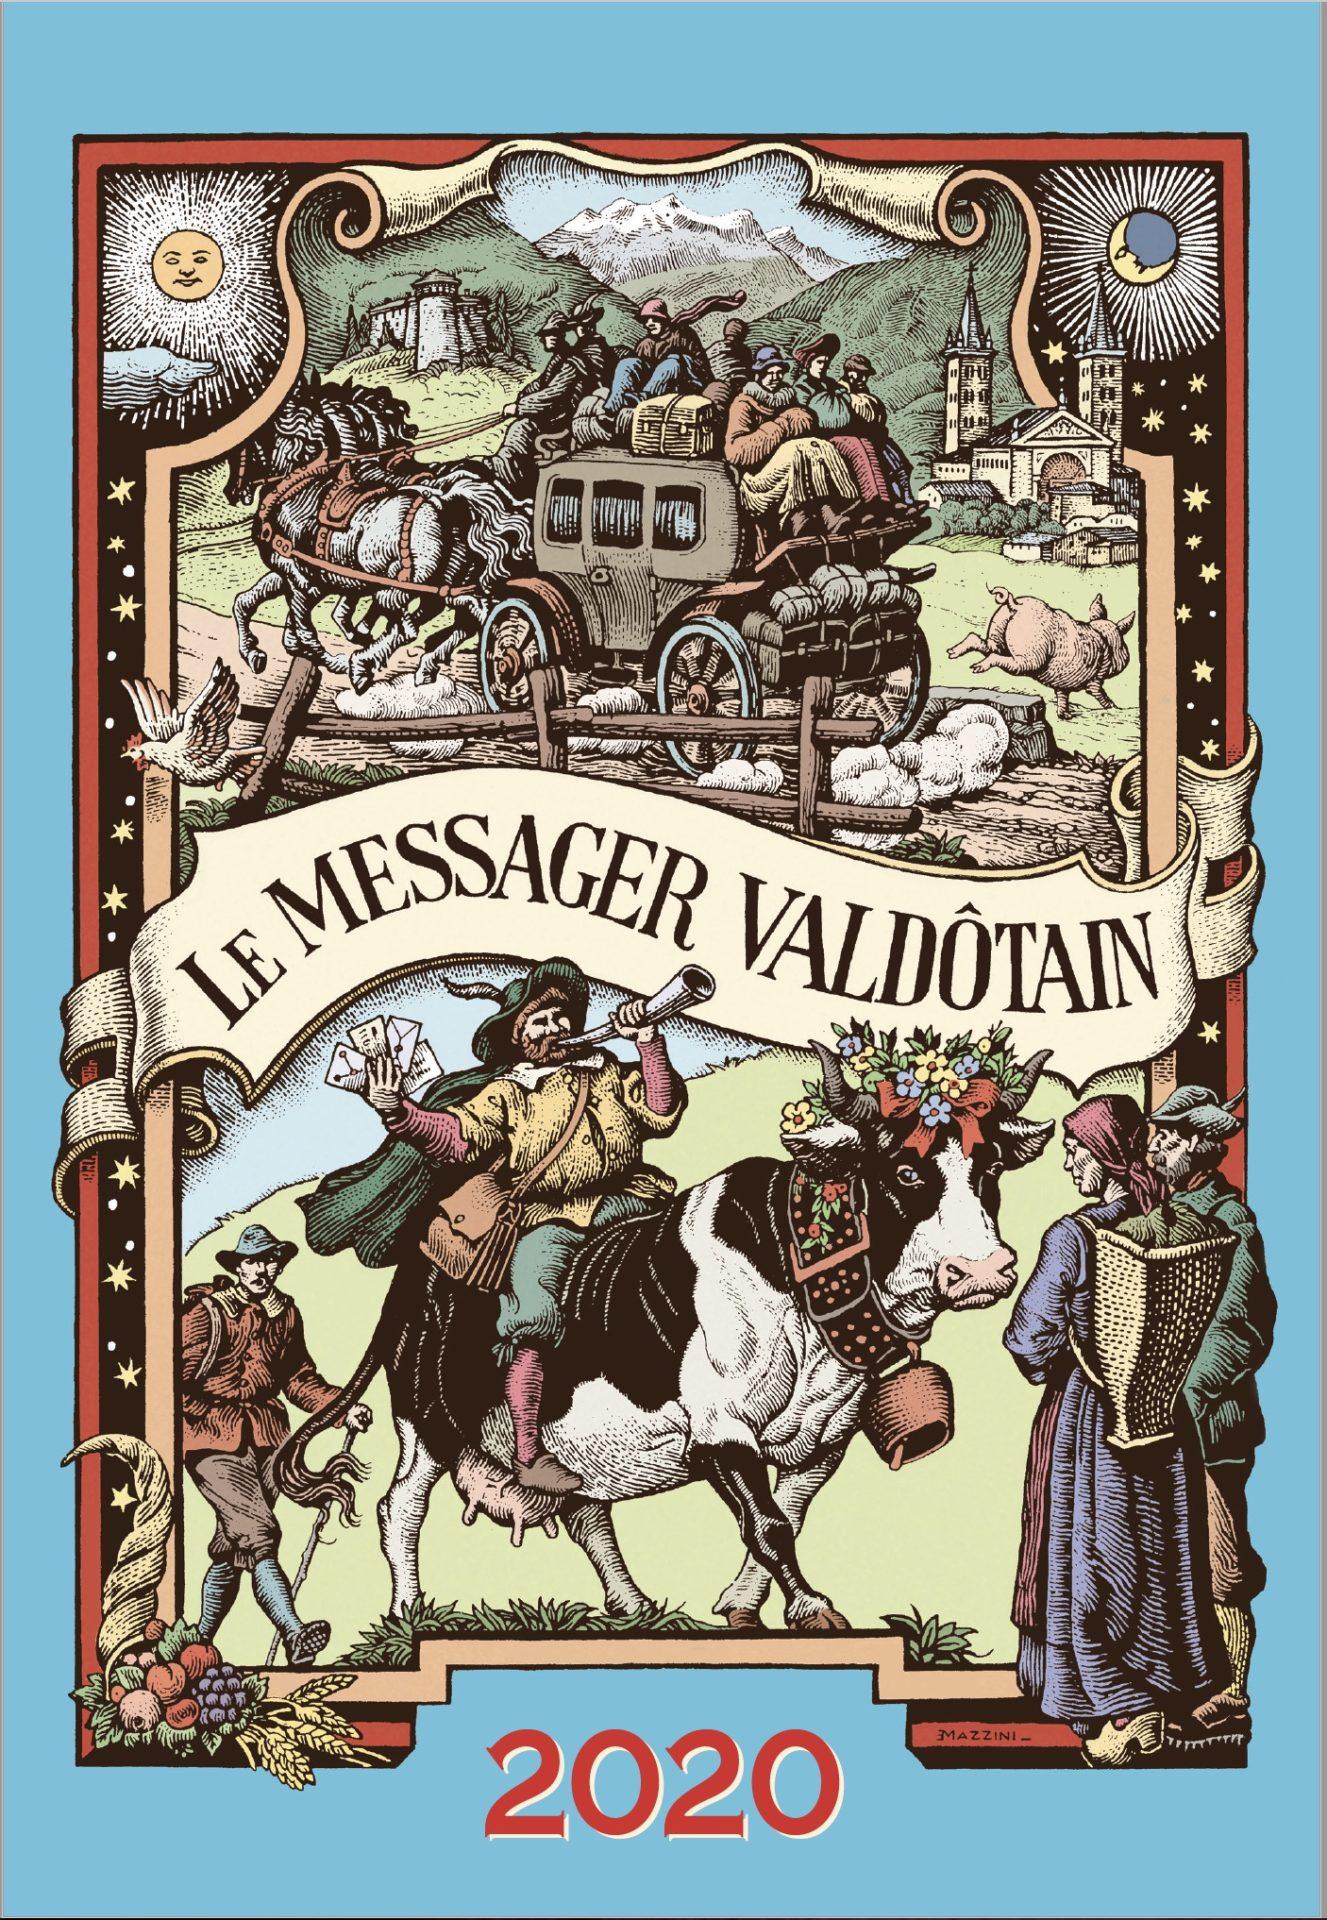 Il Messager Valdotain